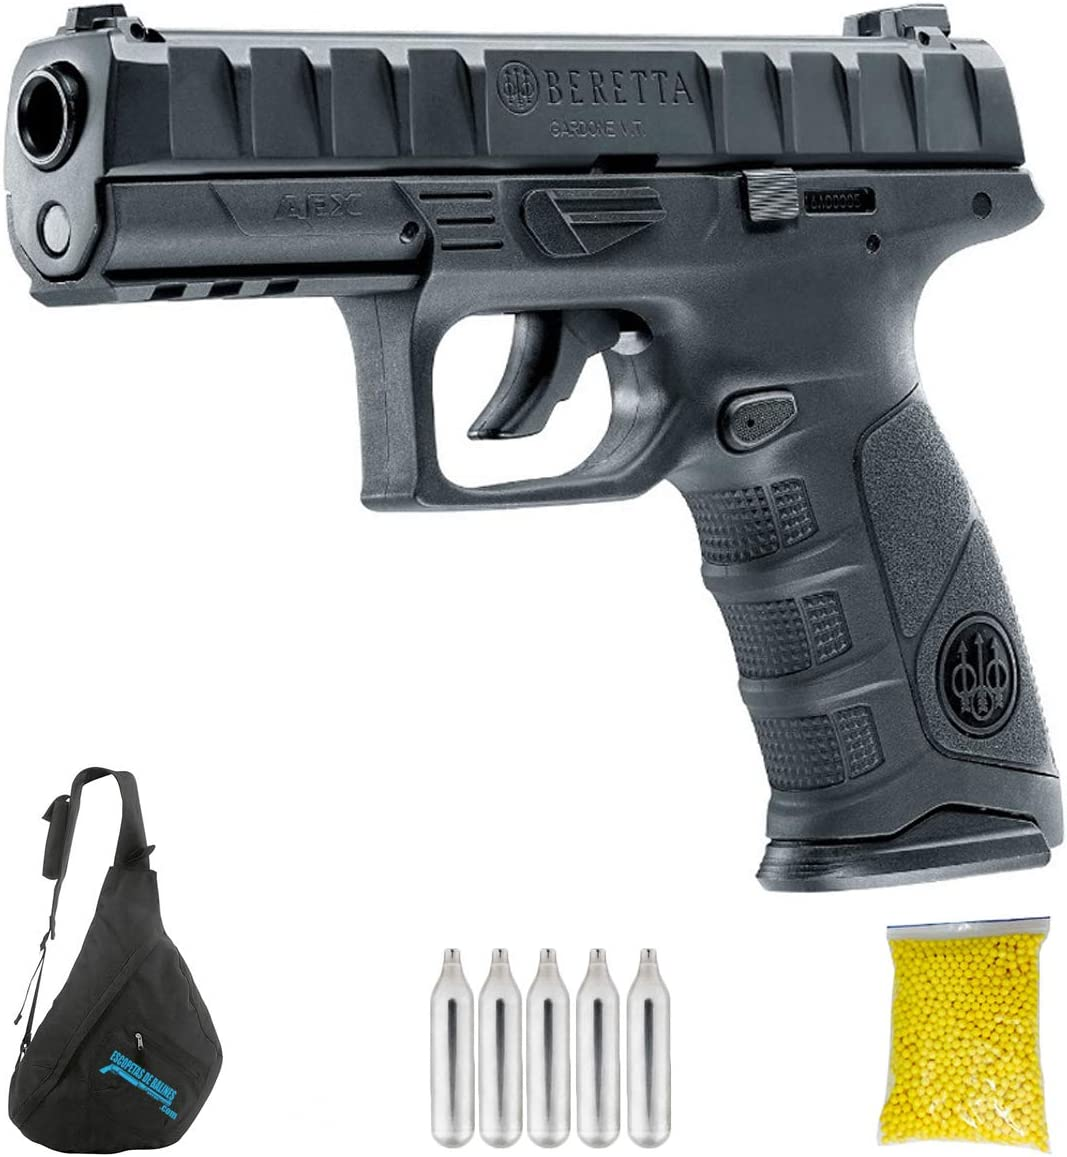 UMAREX BERETTA APX M12 | Pack Pistola de balines (perdigones o Bolas de Acero BB's). Arma de Aire comprimido. CO2. Calibre 6 mm. 1.4 Julios.